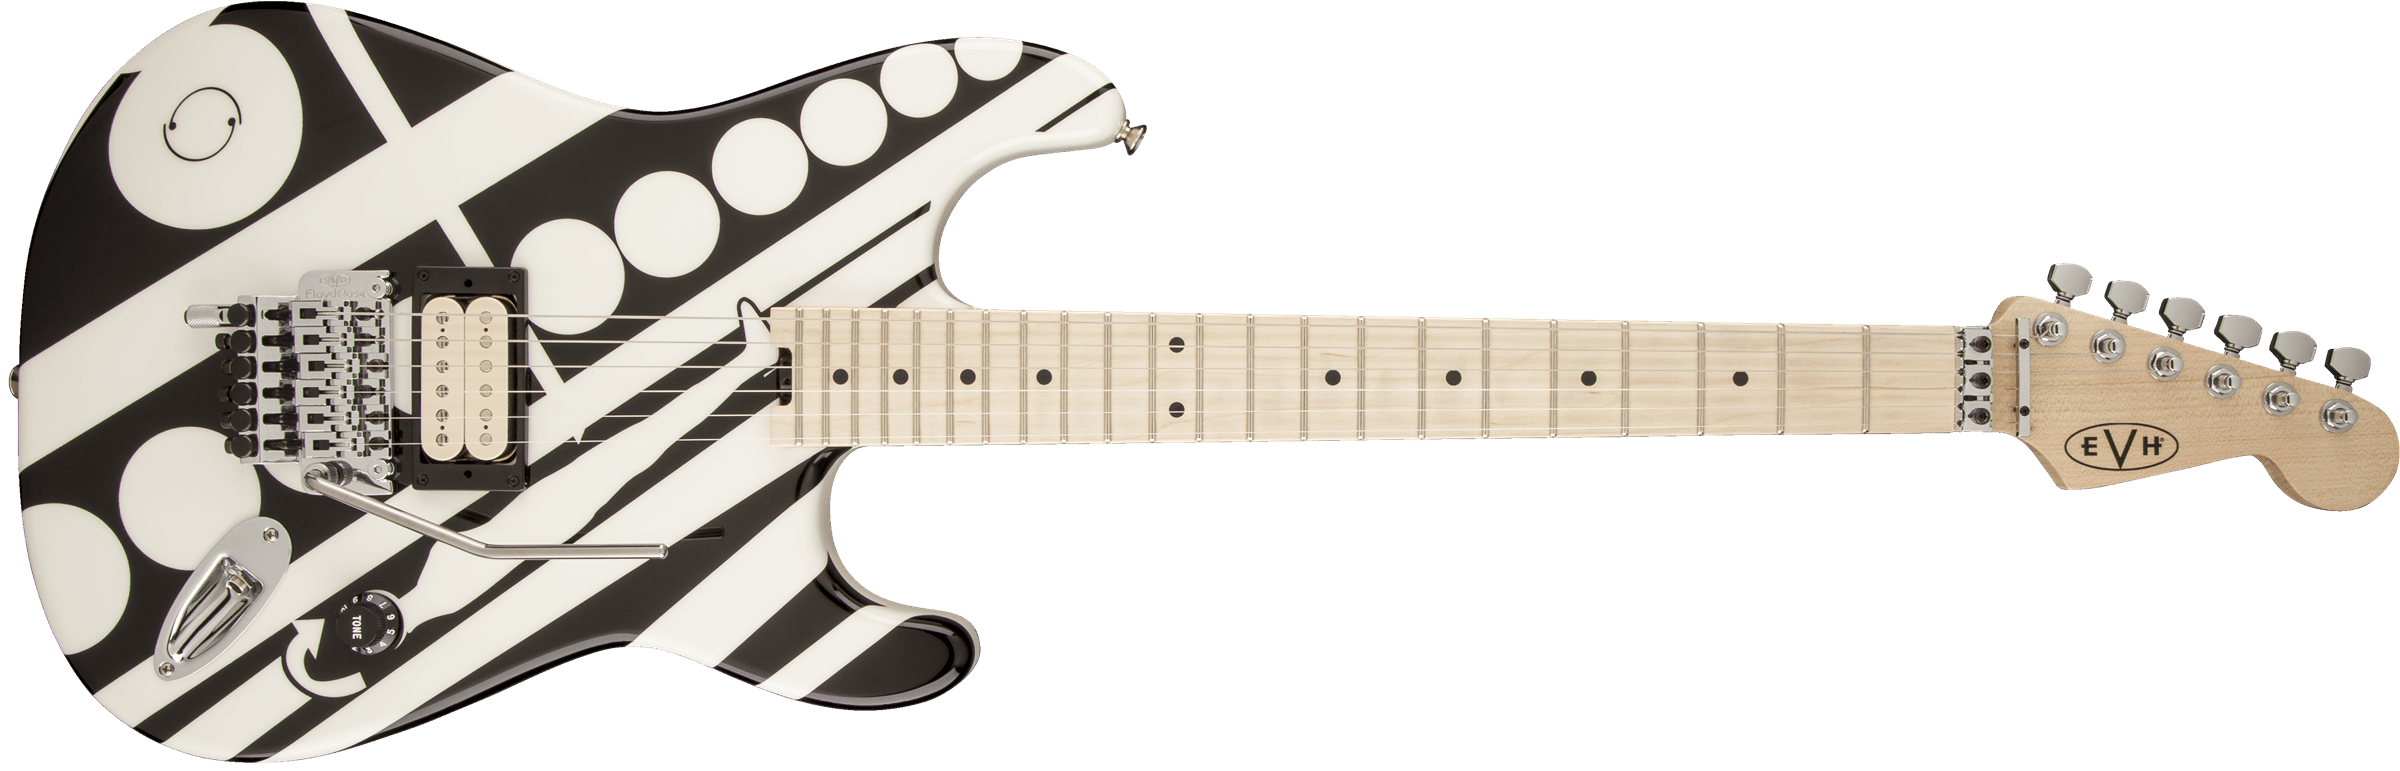 Evh Striped Series Circles See Ya Guitar Black And White Van Halen